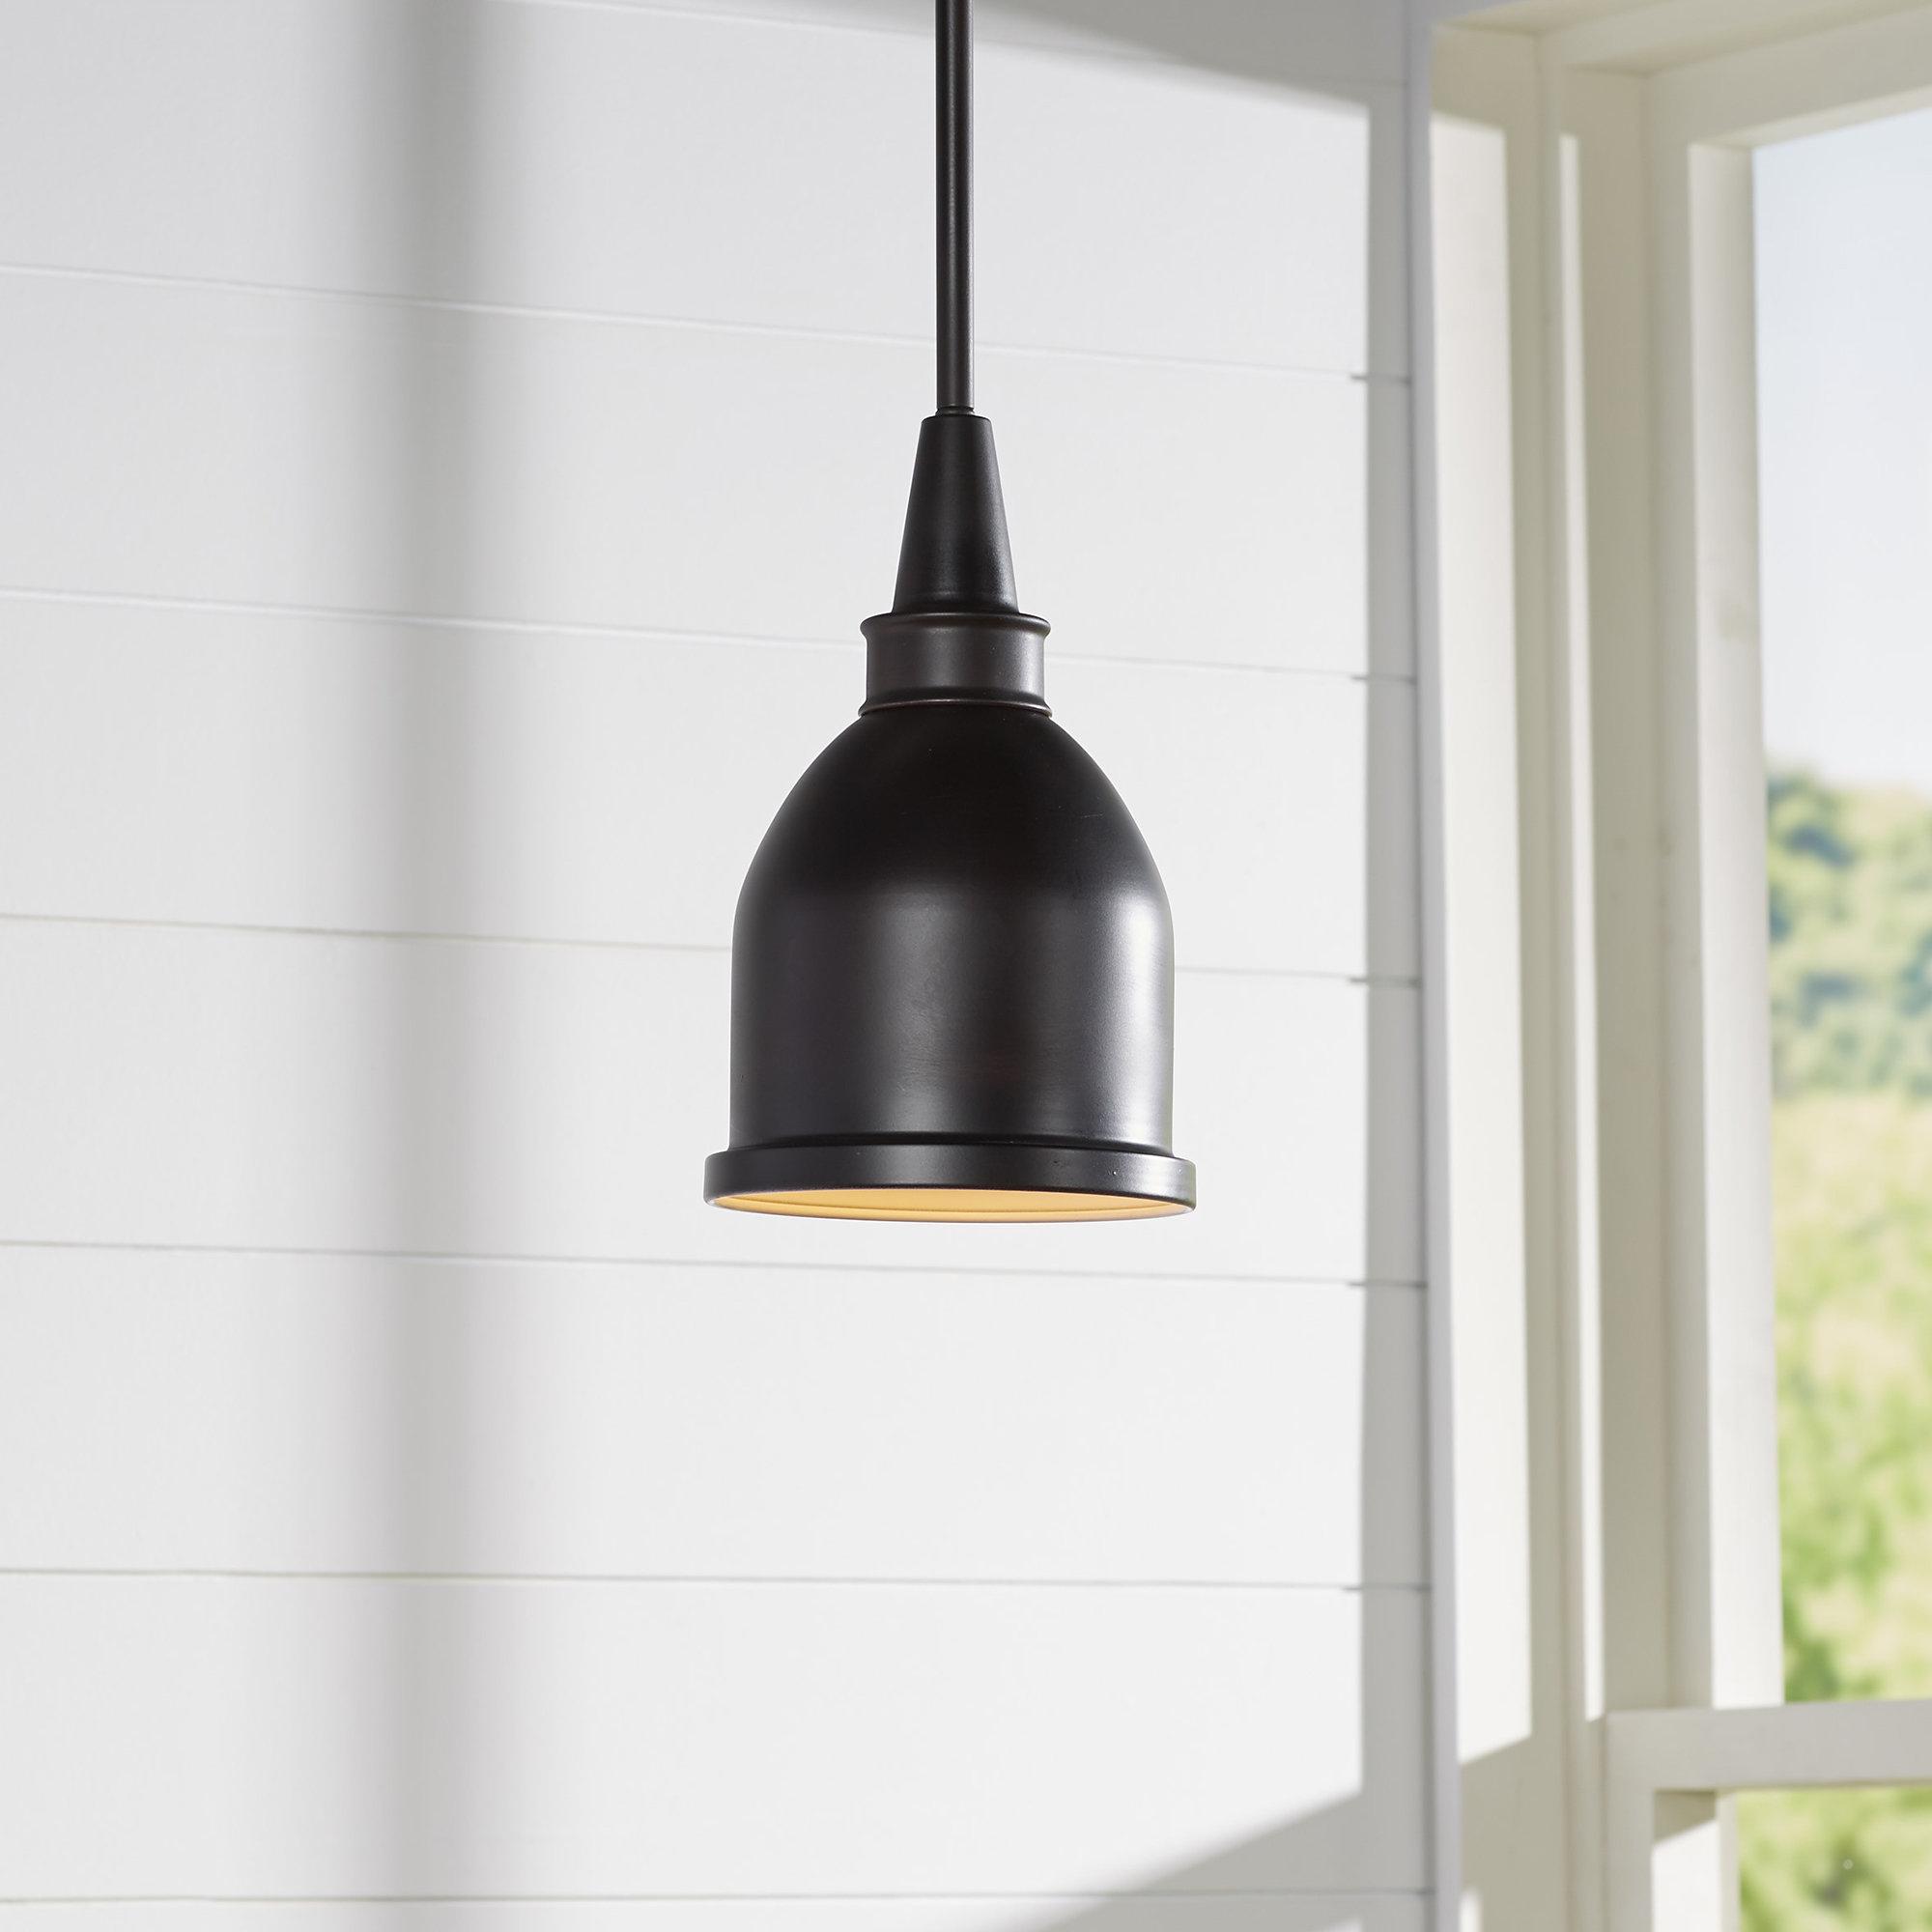 Hamilton 1 Light Single Dome Pendants Intended For Recent Manston 1 Light Single Bell Pendant (View 11 of 20)